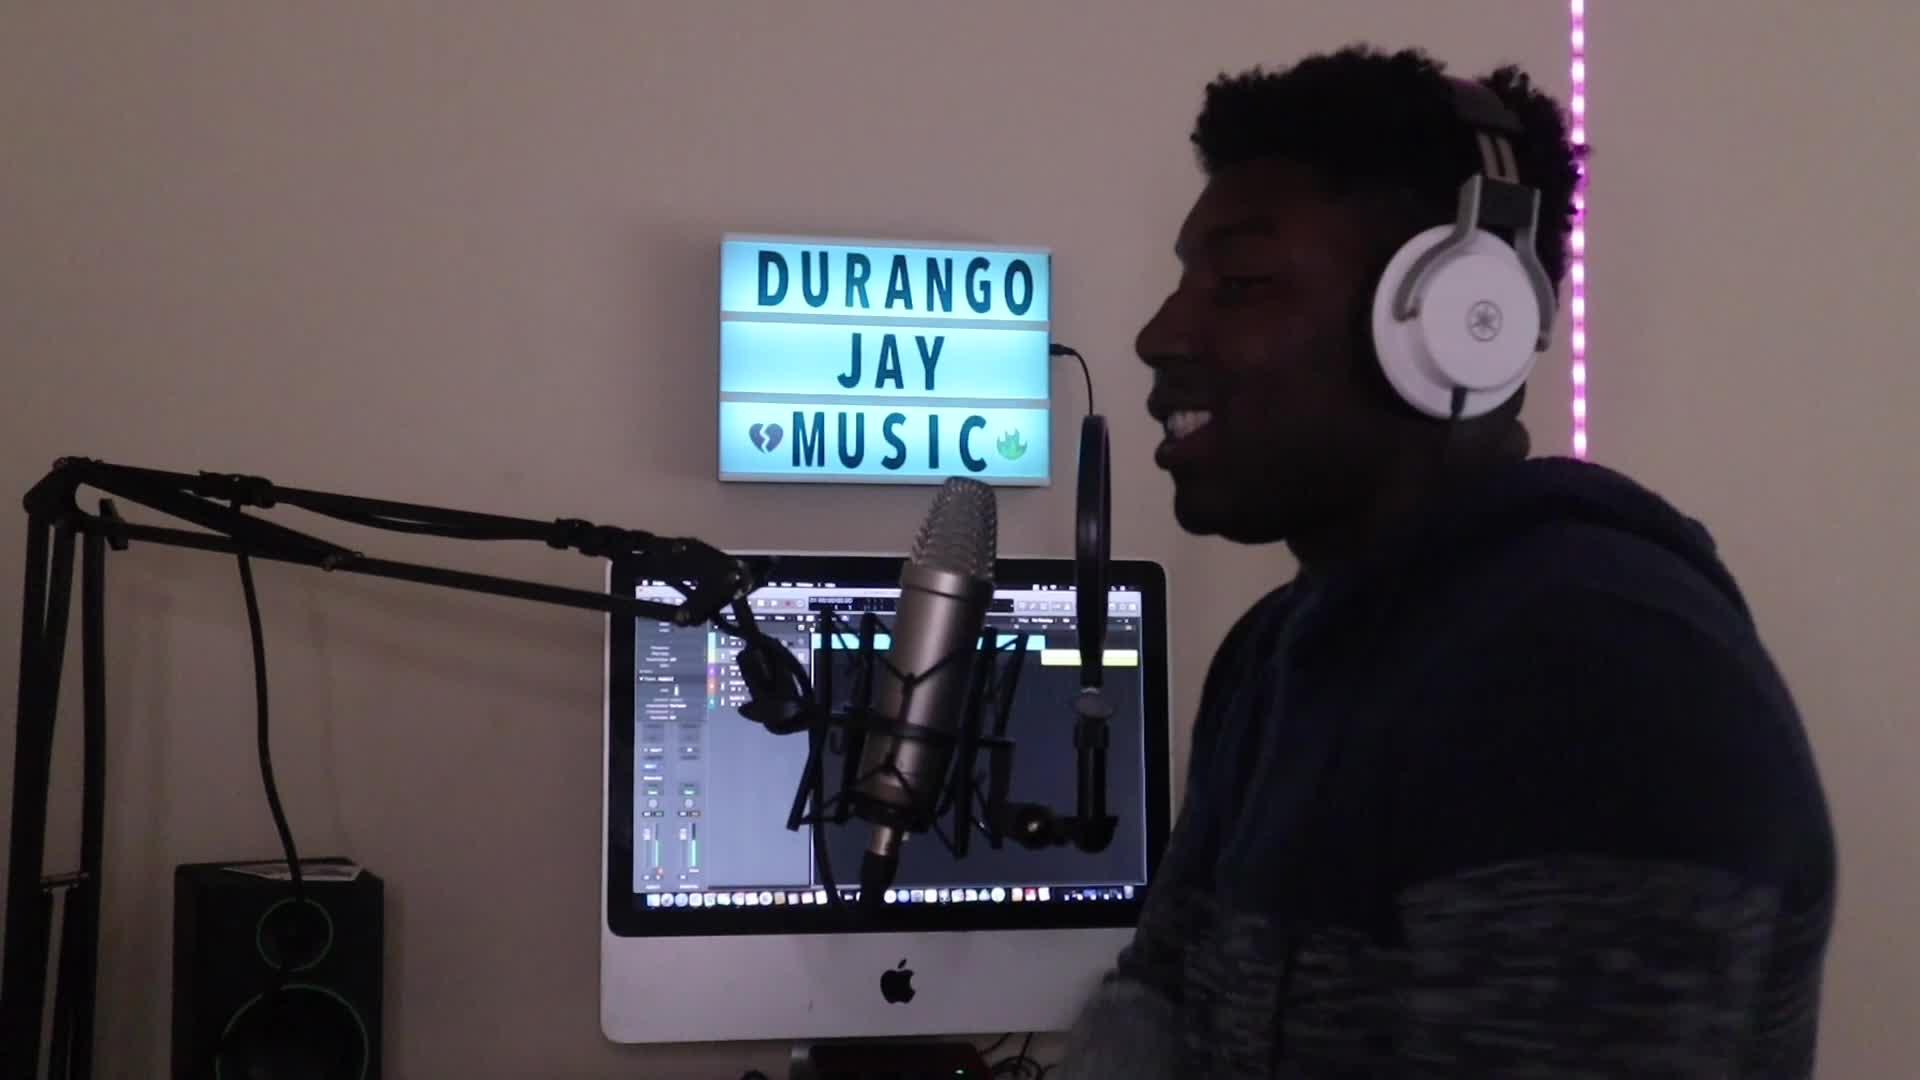 professional-music-audio-freelancer-image-162766